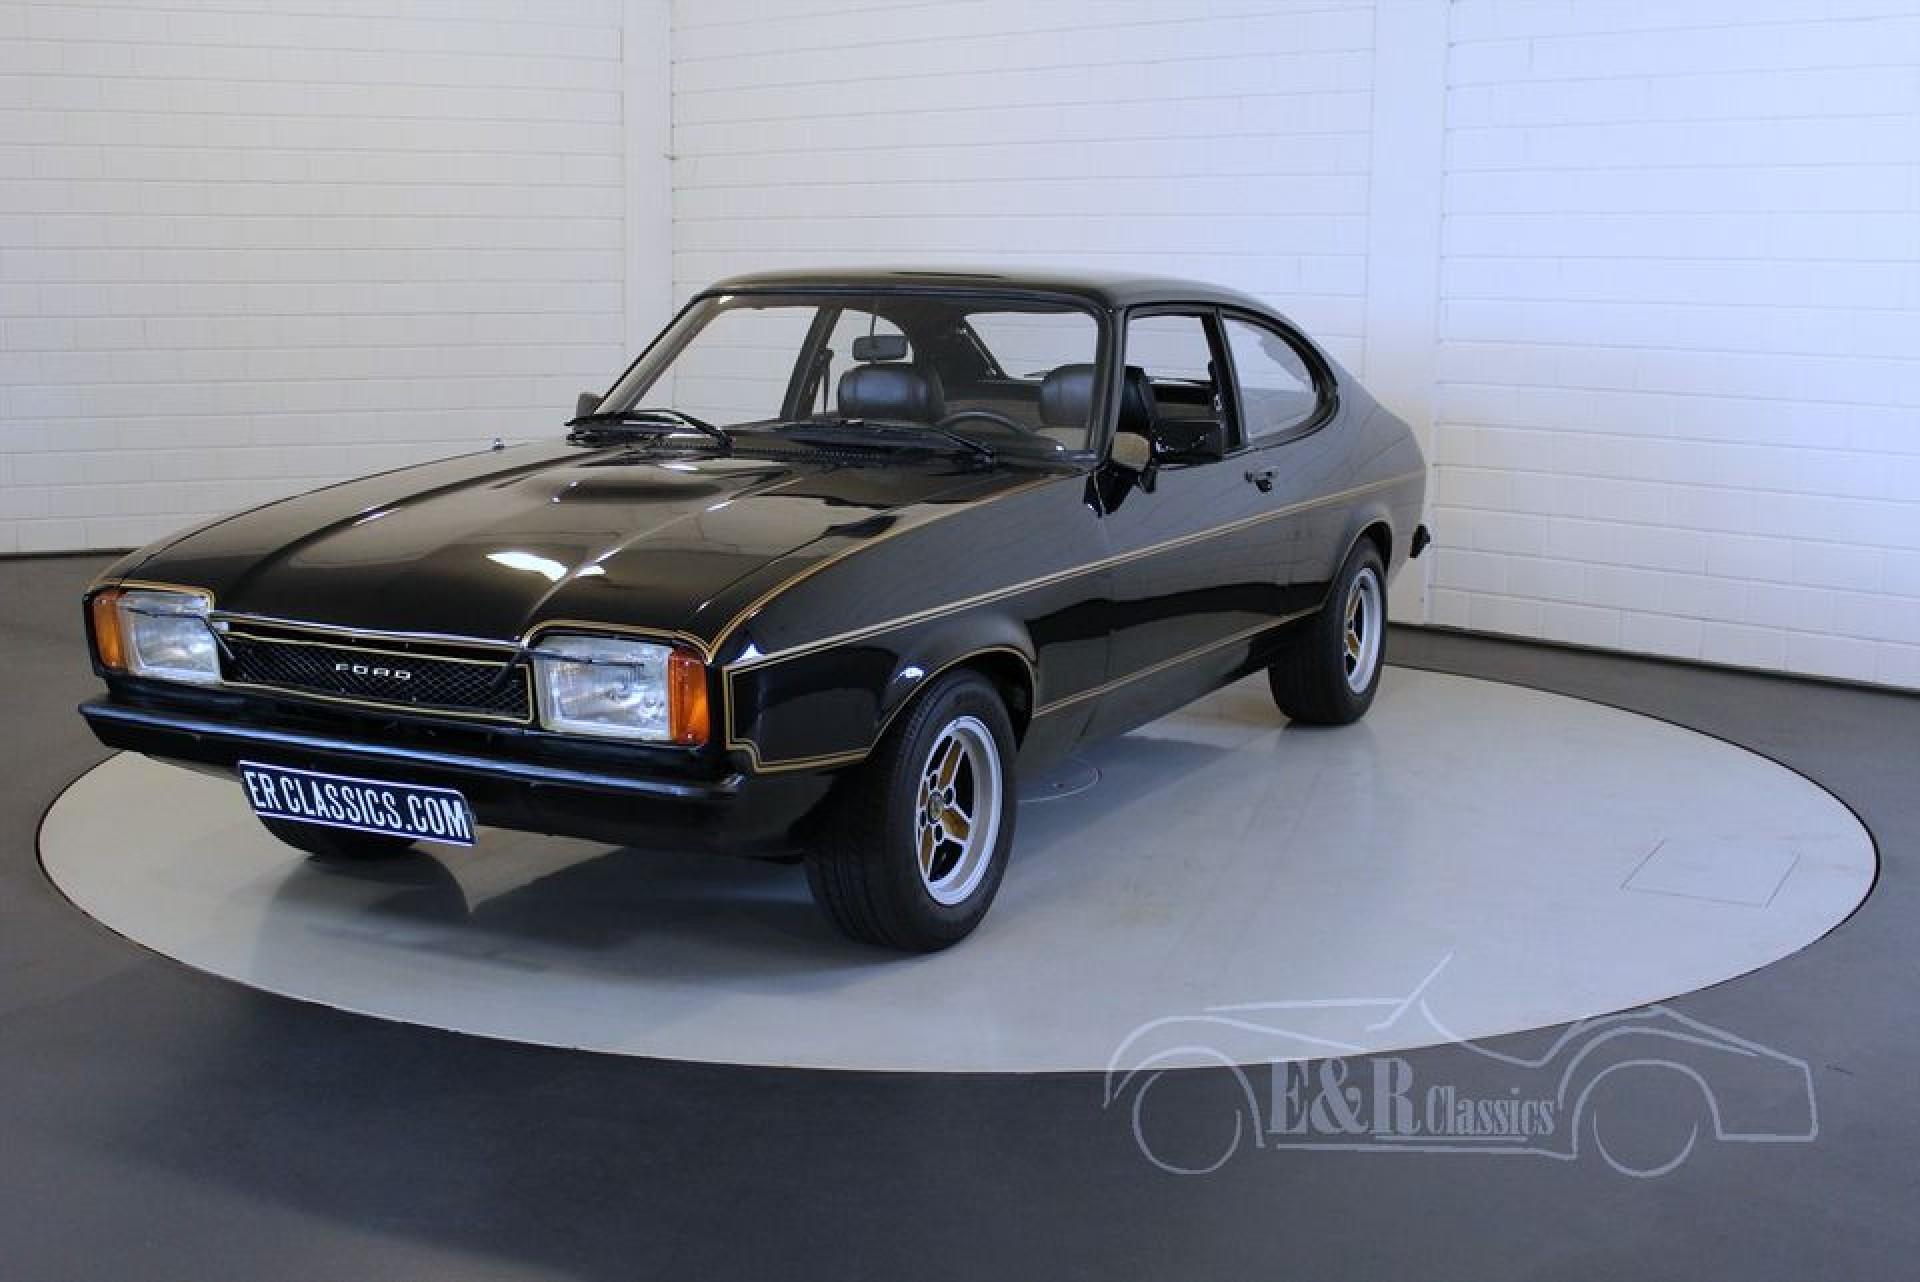 Ford Capri Ii Jps 1975 For Sale At Erclassics